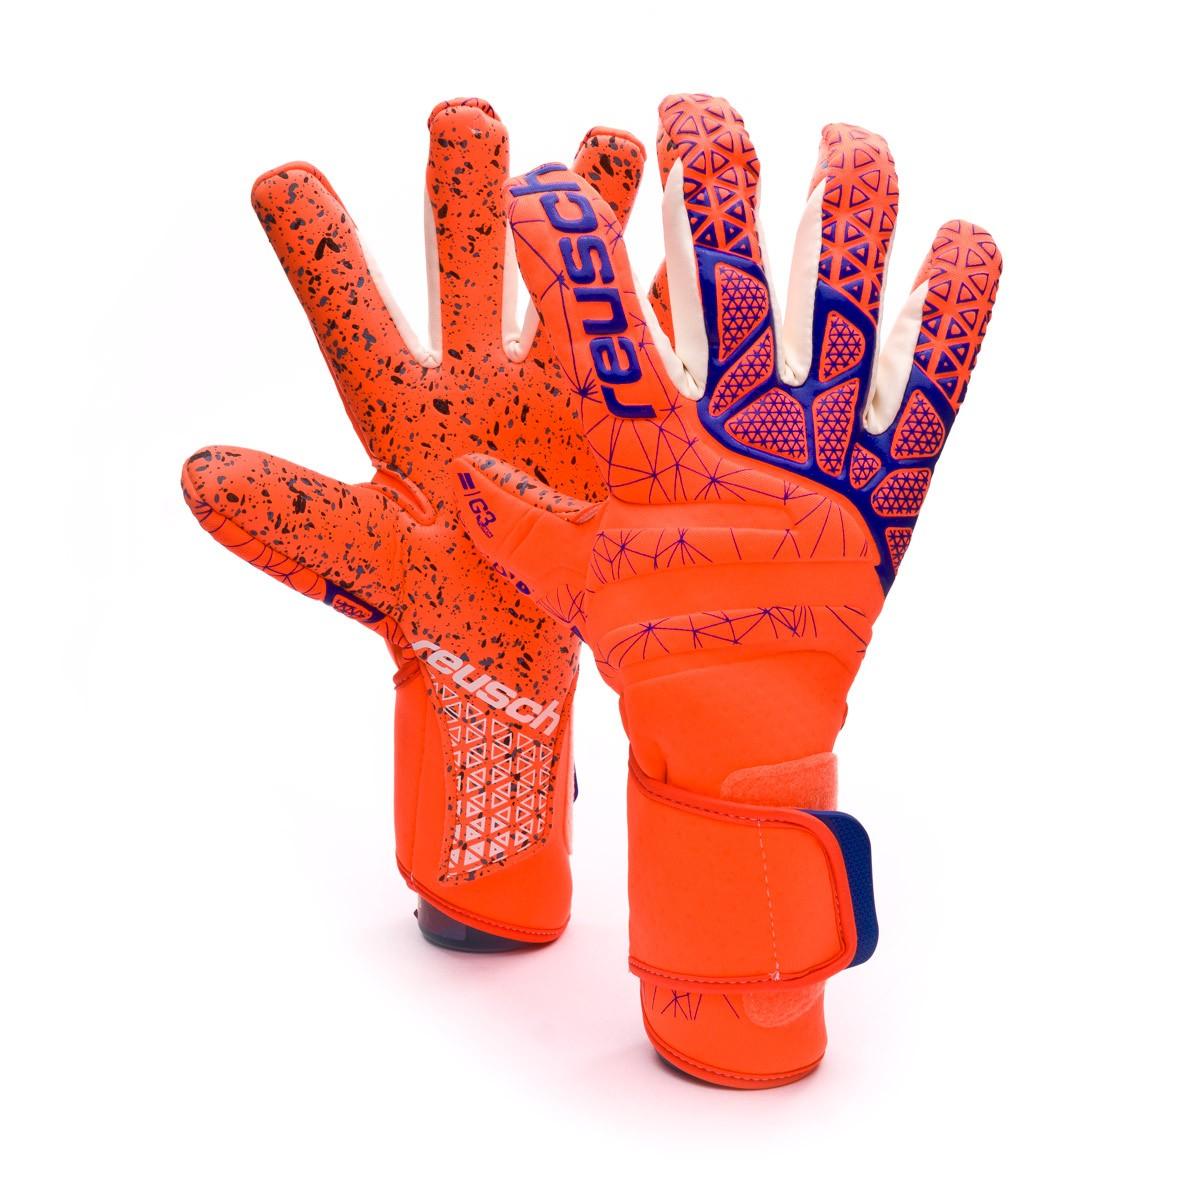 Glove Reusch Pure Contact G3 Fusion Shocking orange-Blue-Shocking ... 25216ba2dc4f